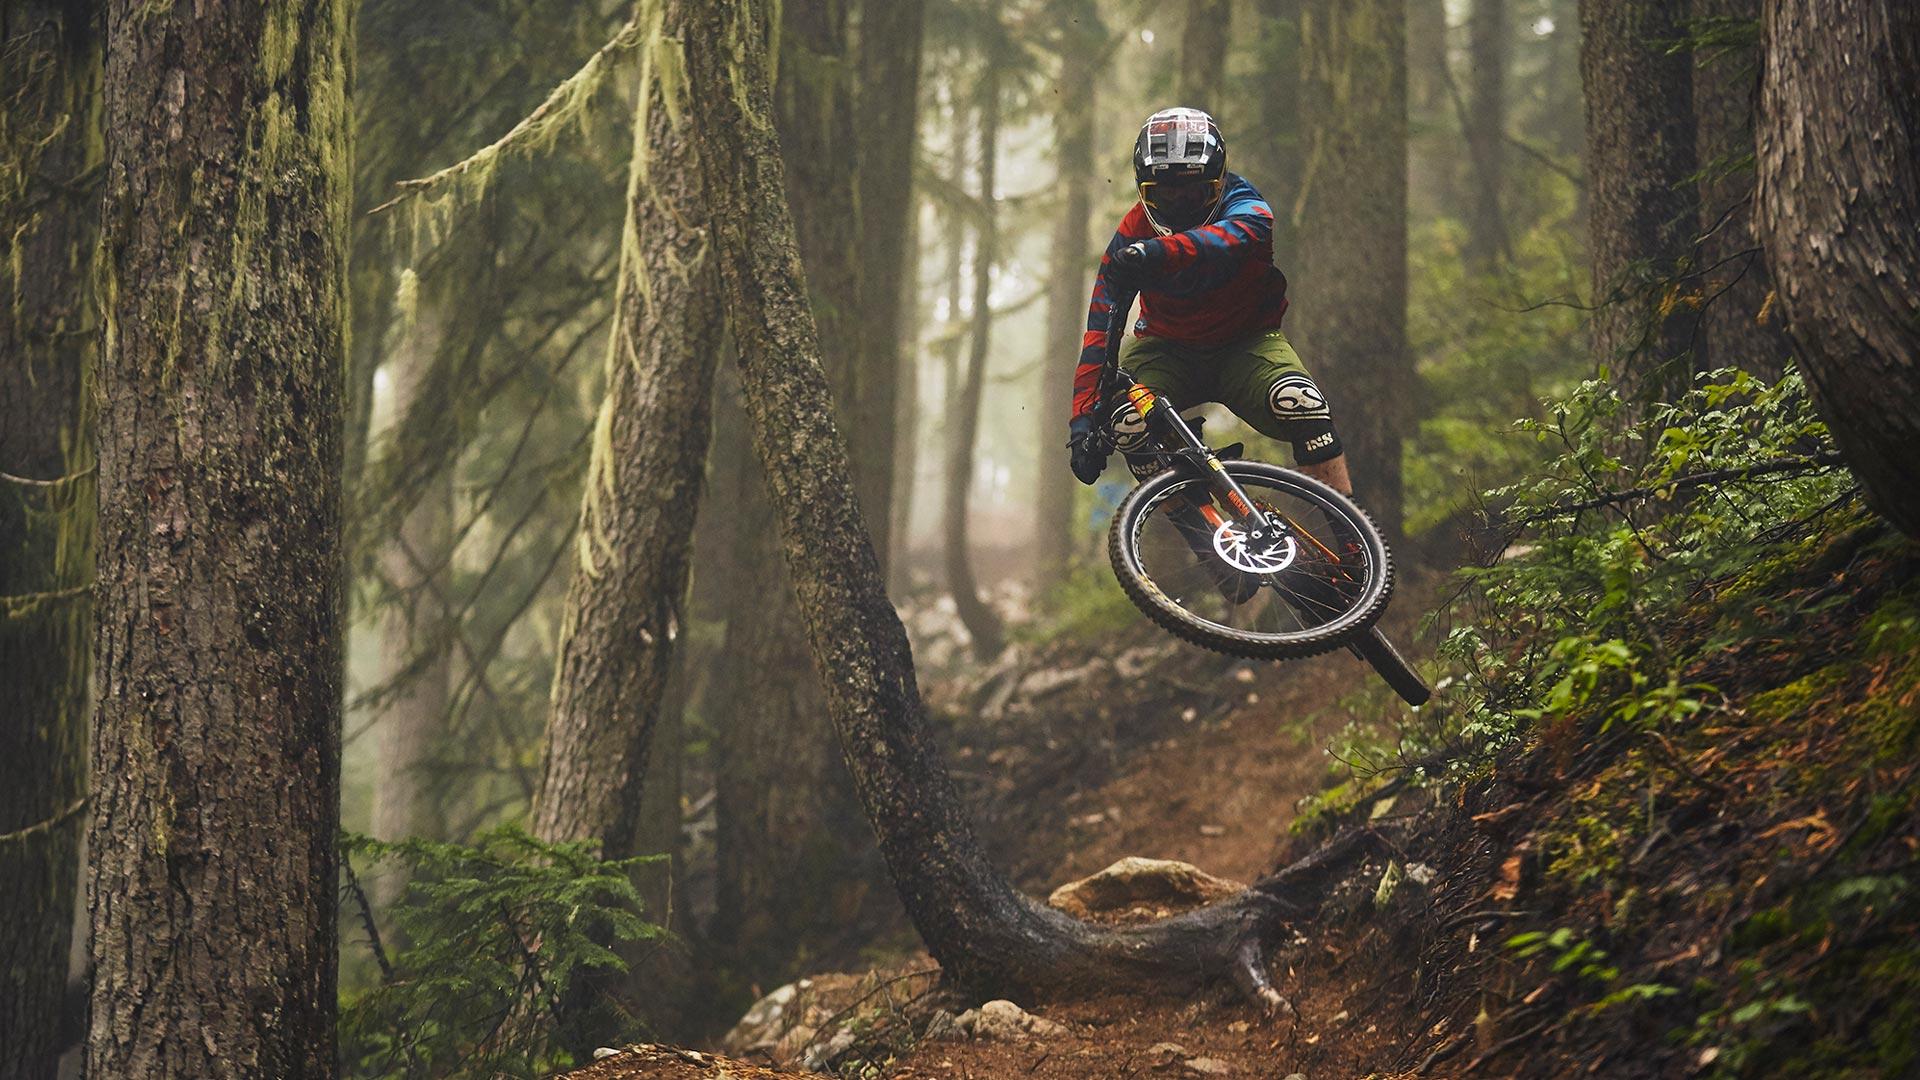 New Bike Hd >> Video: Whistler Bike Park Opening Day - SnowBrains